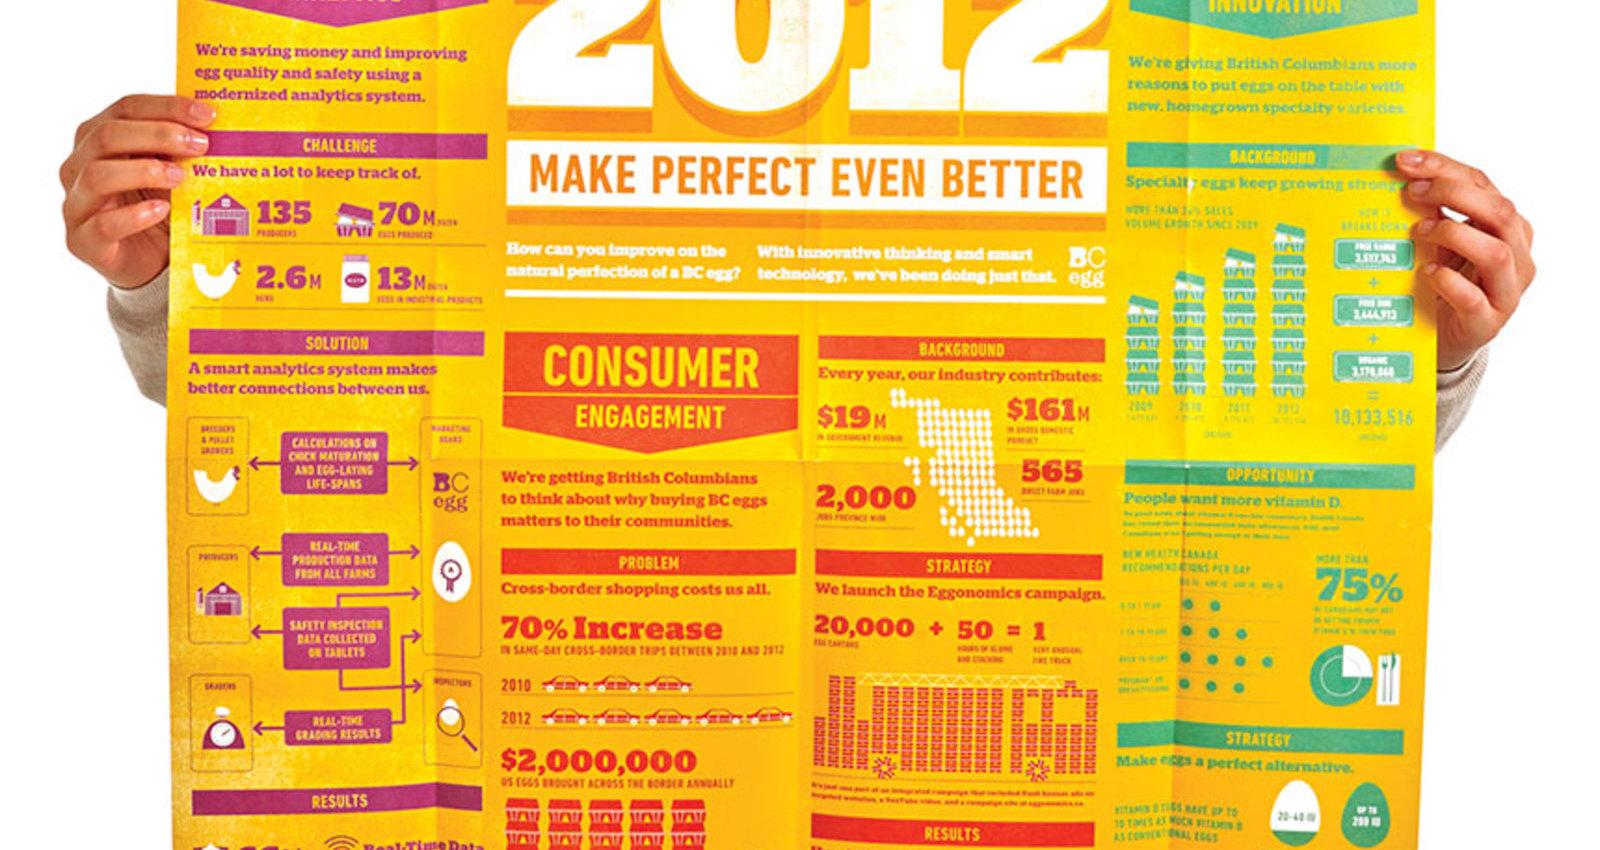 Make Perfect Even Better